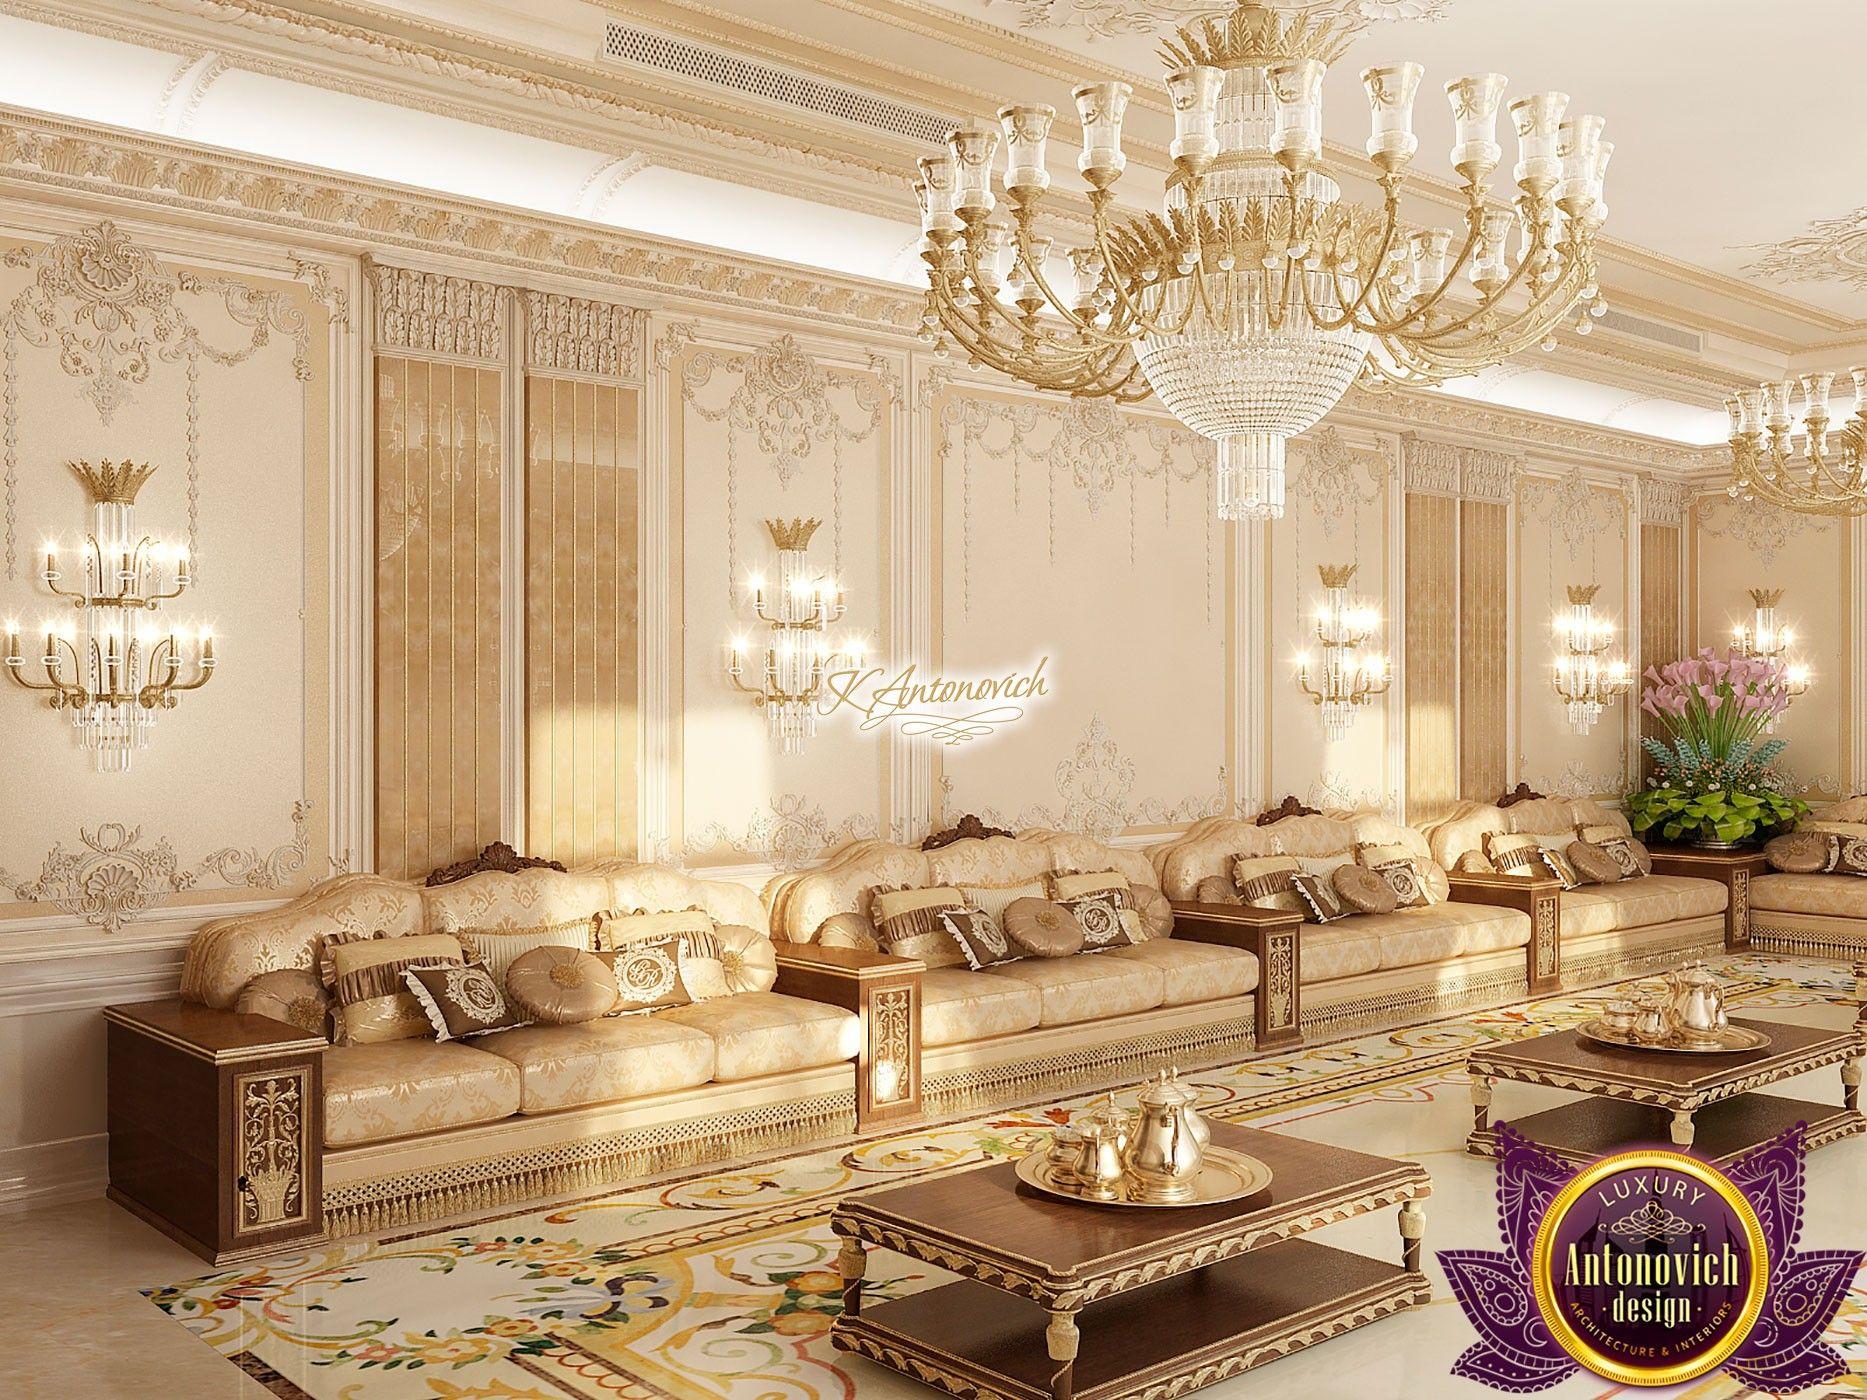 Arabic Majlis Interior Design Favorite Concept Design Of All Time Superiority And Living Room Sets Furniture Beautiful Living Rooms Living Room Sofa Design